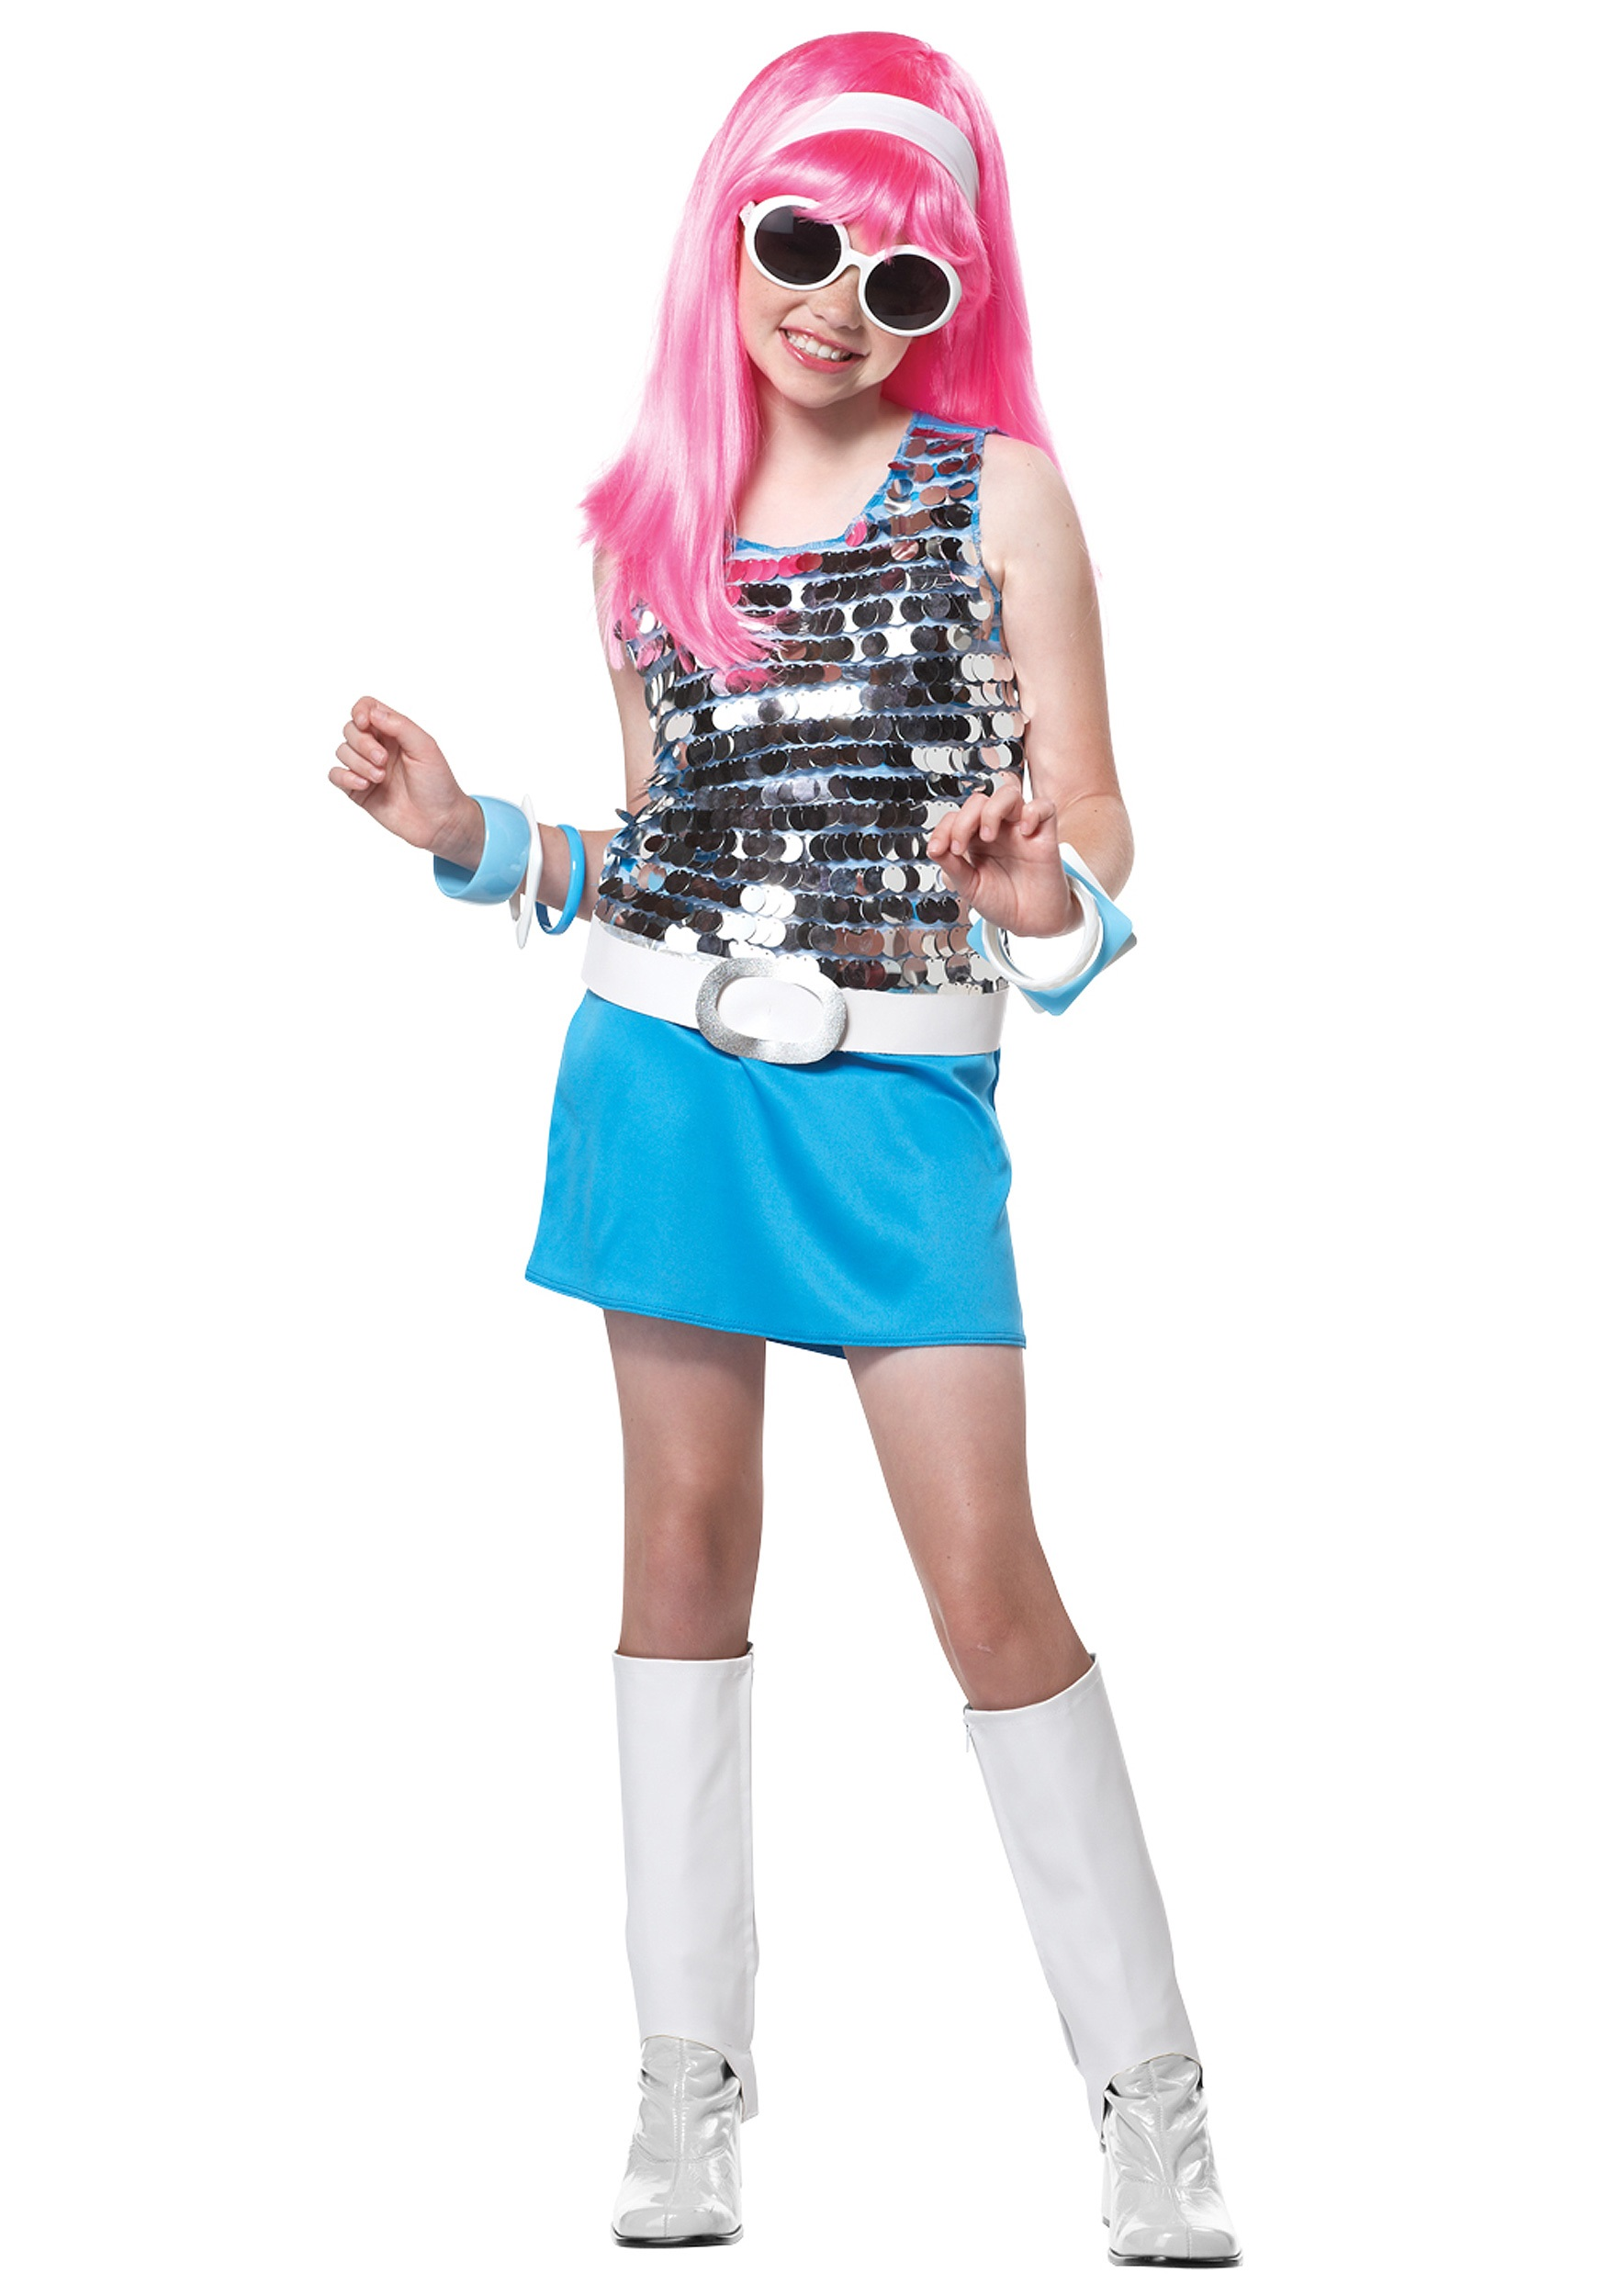 Kids Go Go Girl Costume - Halloween Costume Ideas 2019